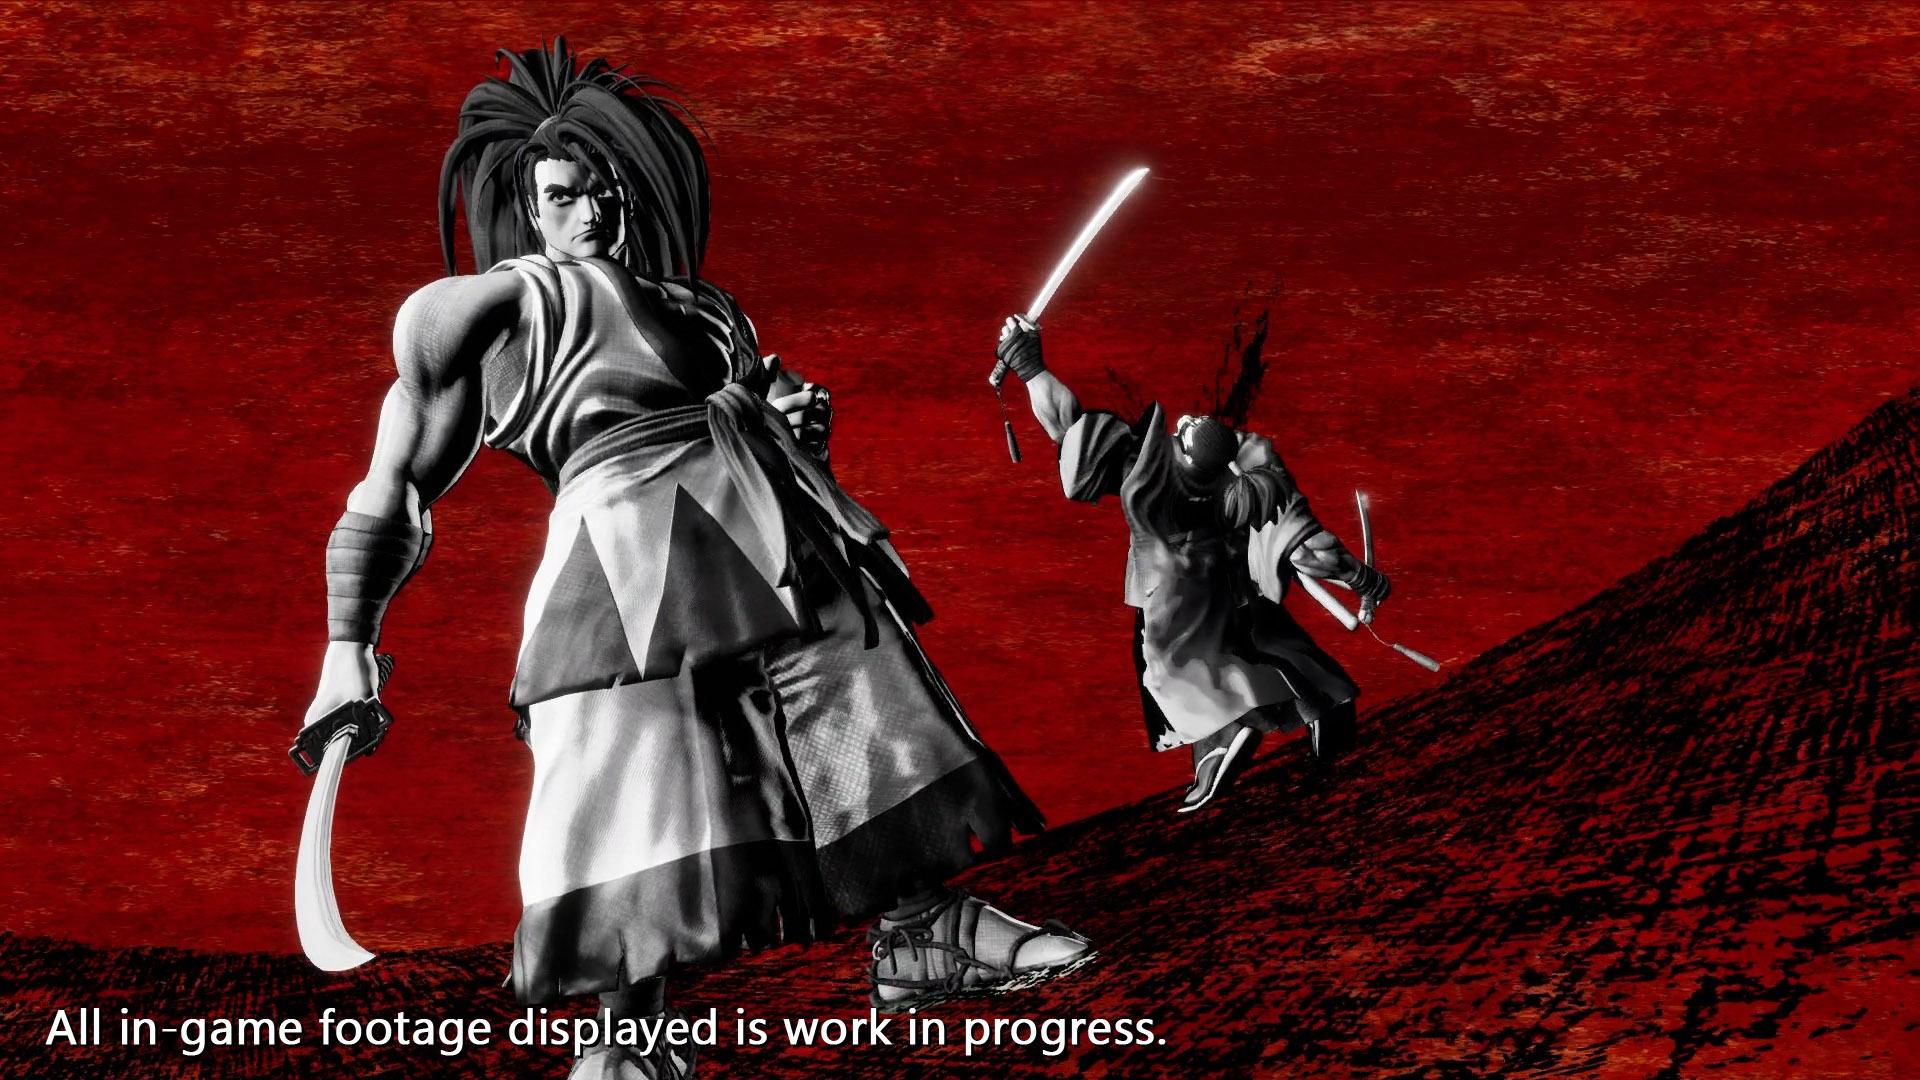 Samurai Spirits/Samurai Shodown